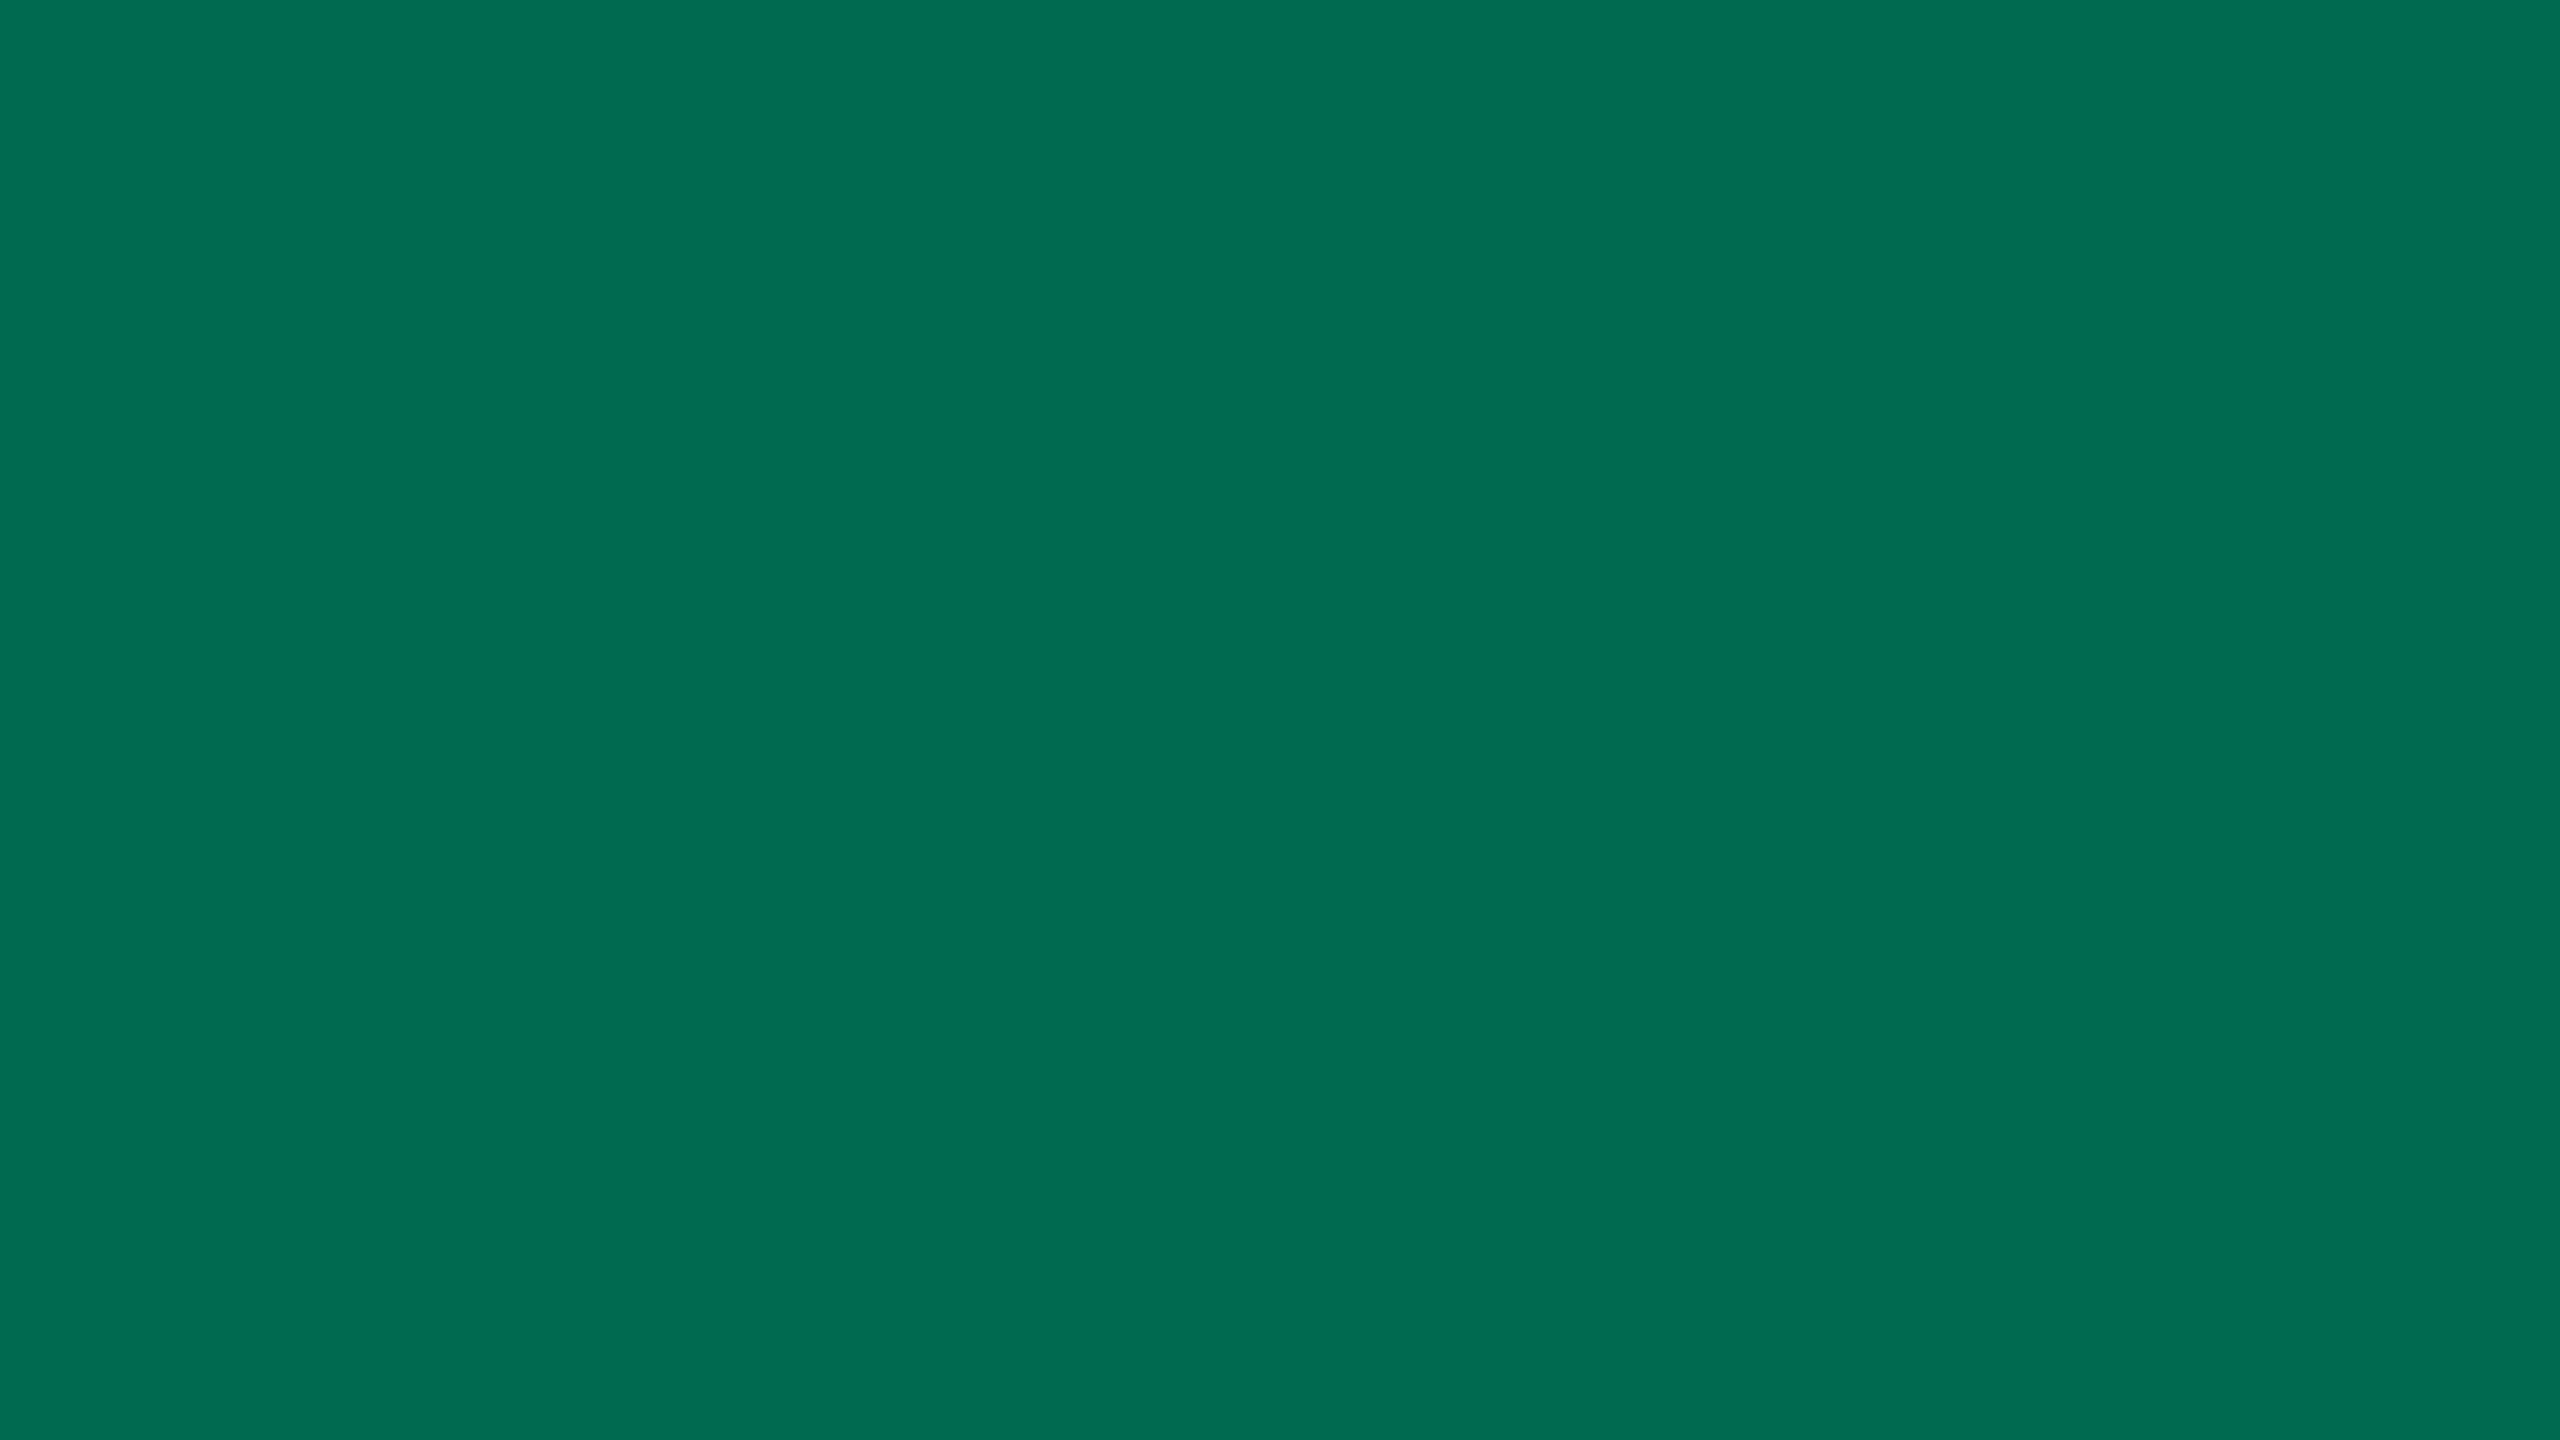 2560x1440 Bottle Green Solid Color Background